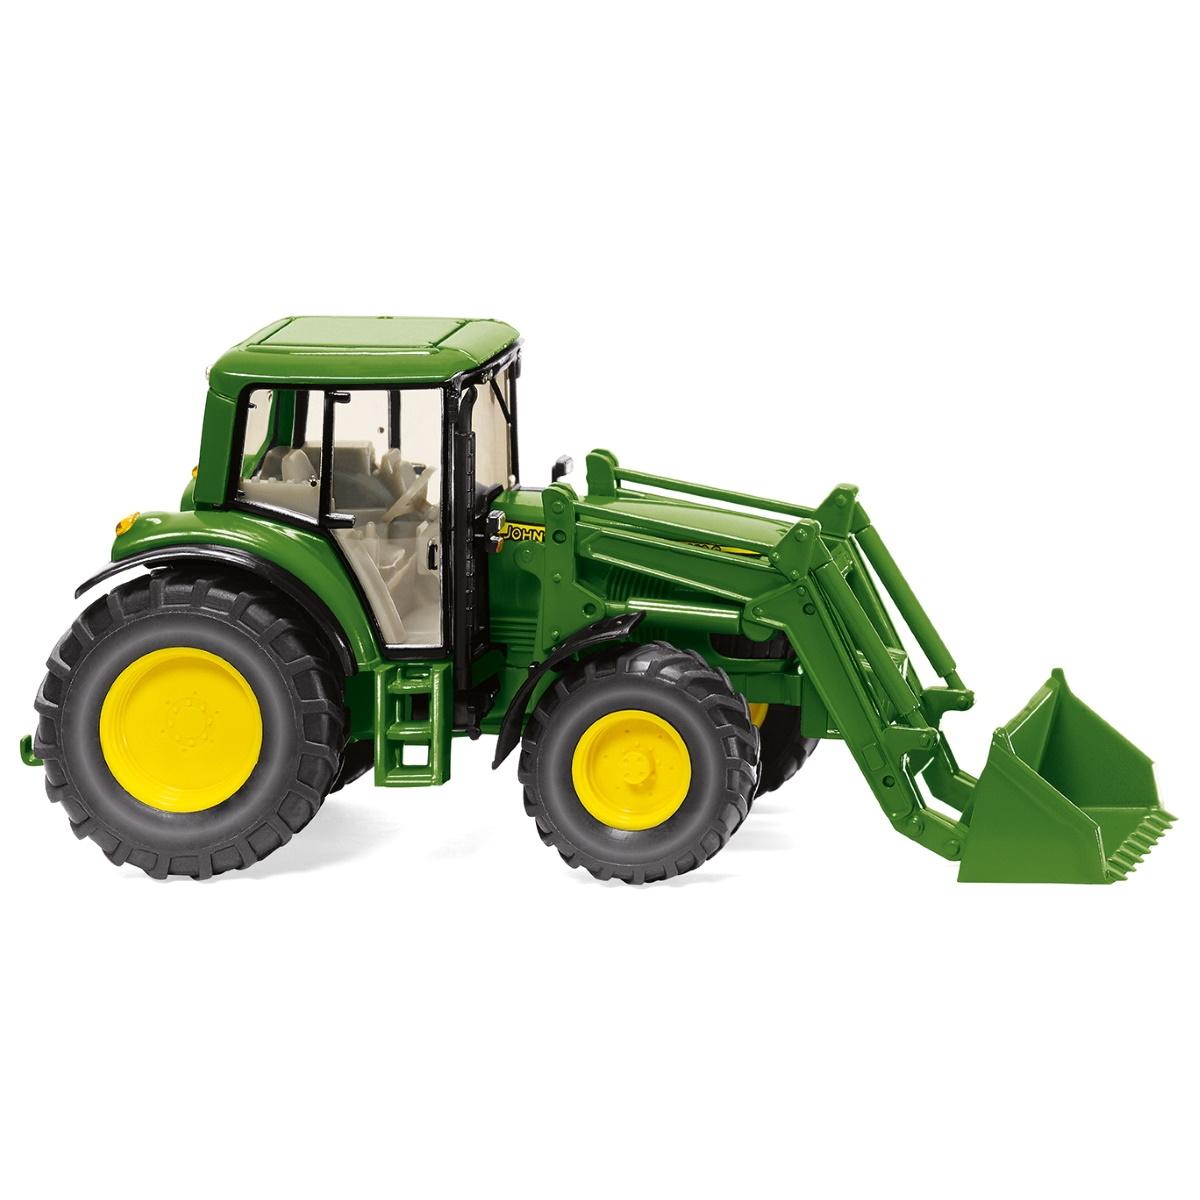 Wiking 039301 Traktor John Deere 6920 S neu 1:87